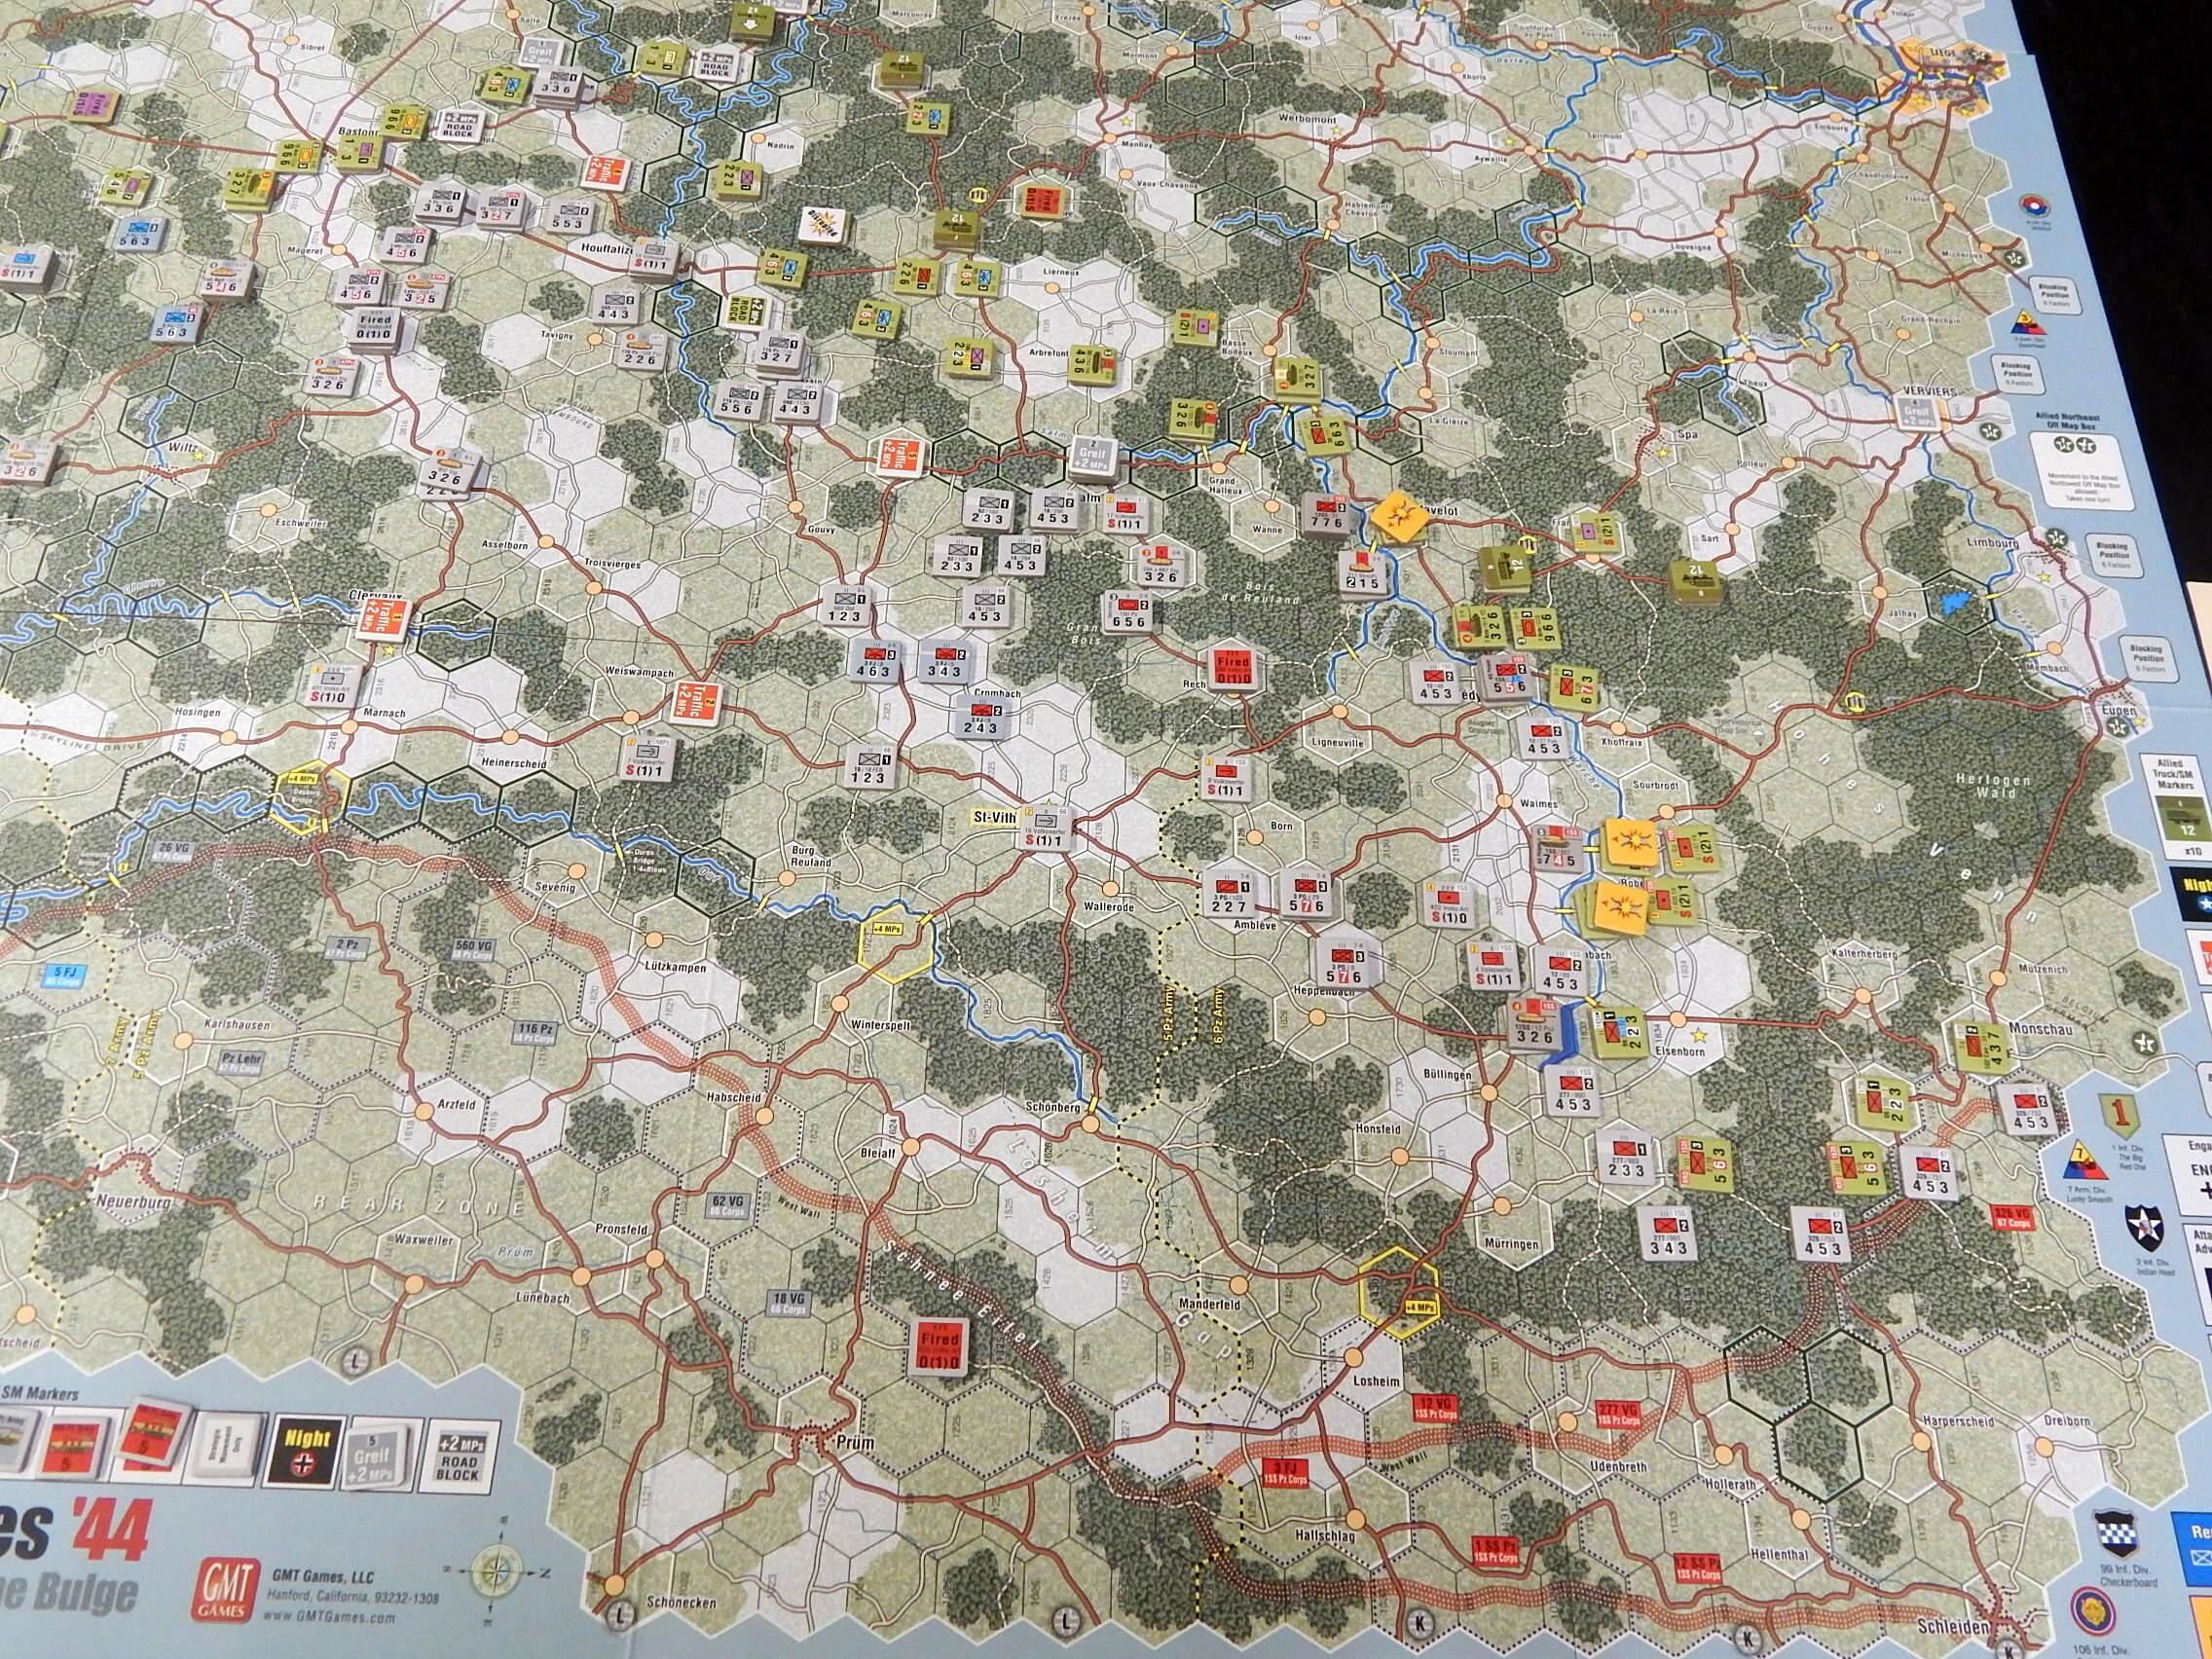 https://i.ibb.co/ryFL7Kr/Ardennes-44-Setup-B.jpg